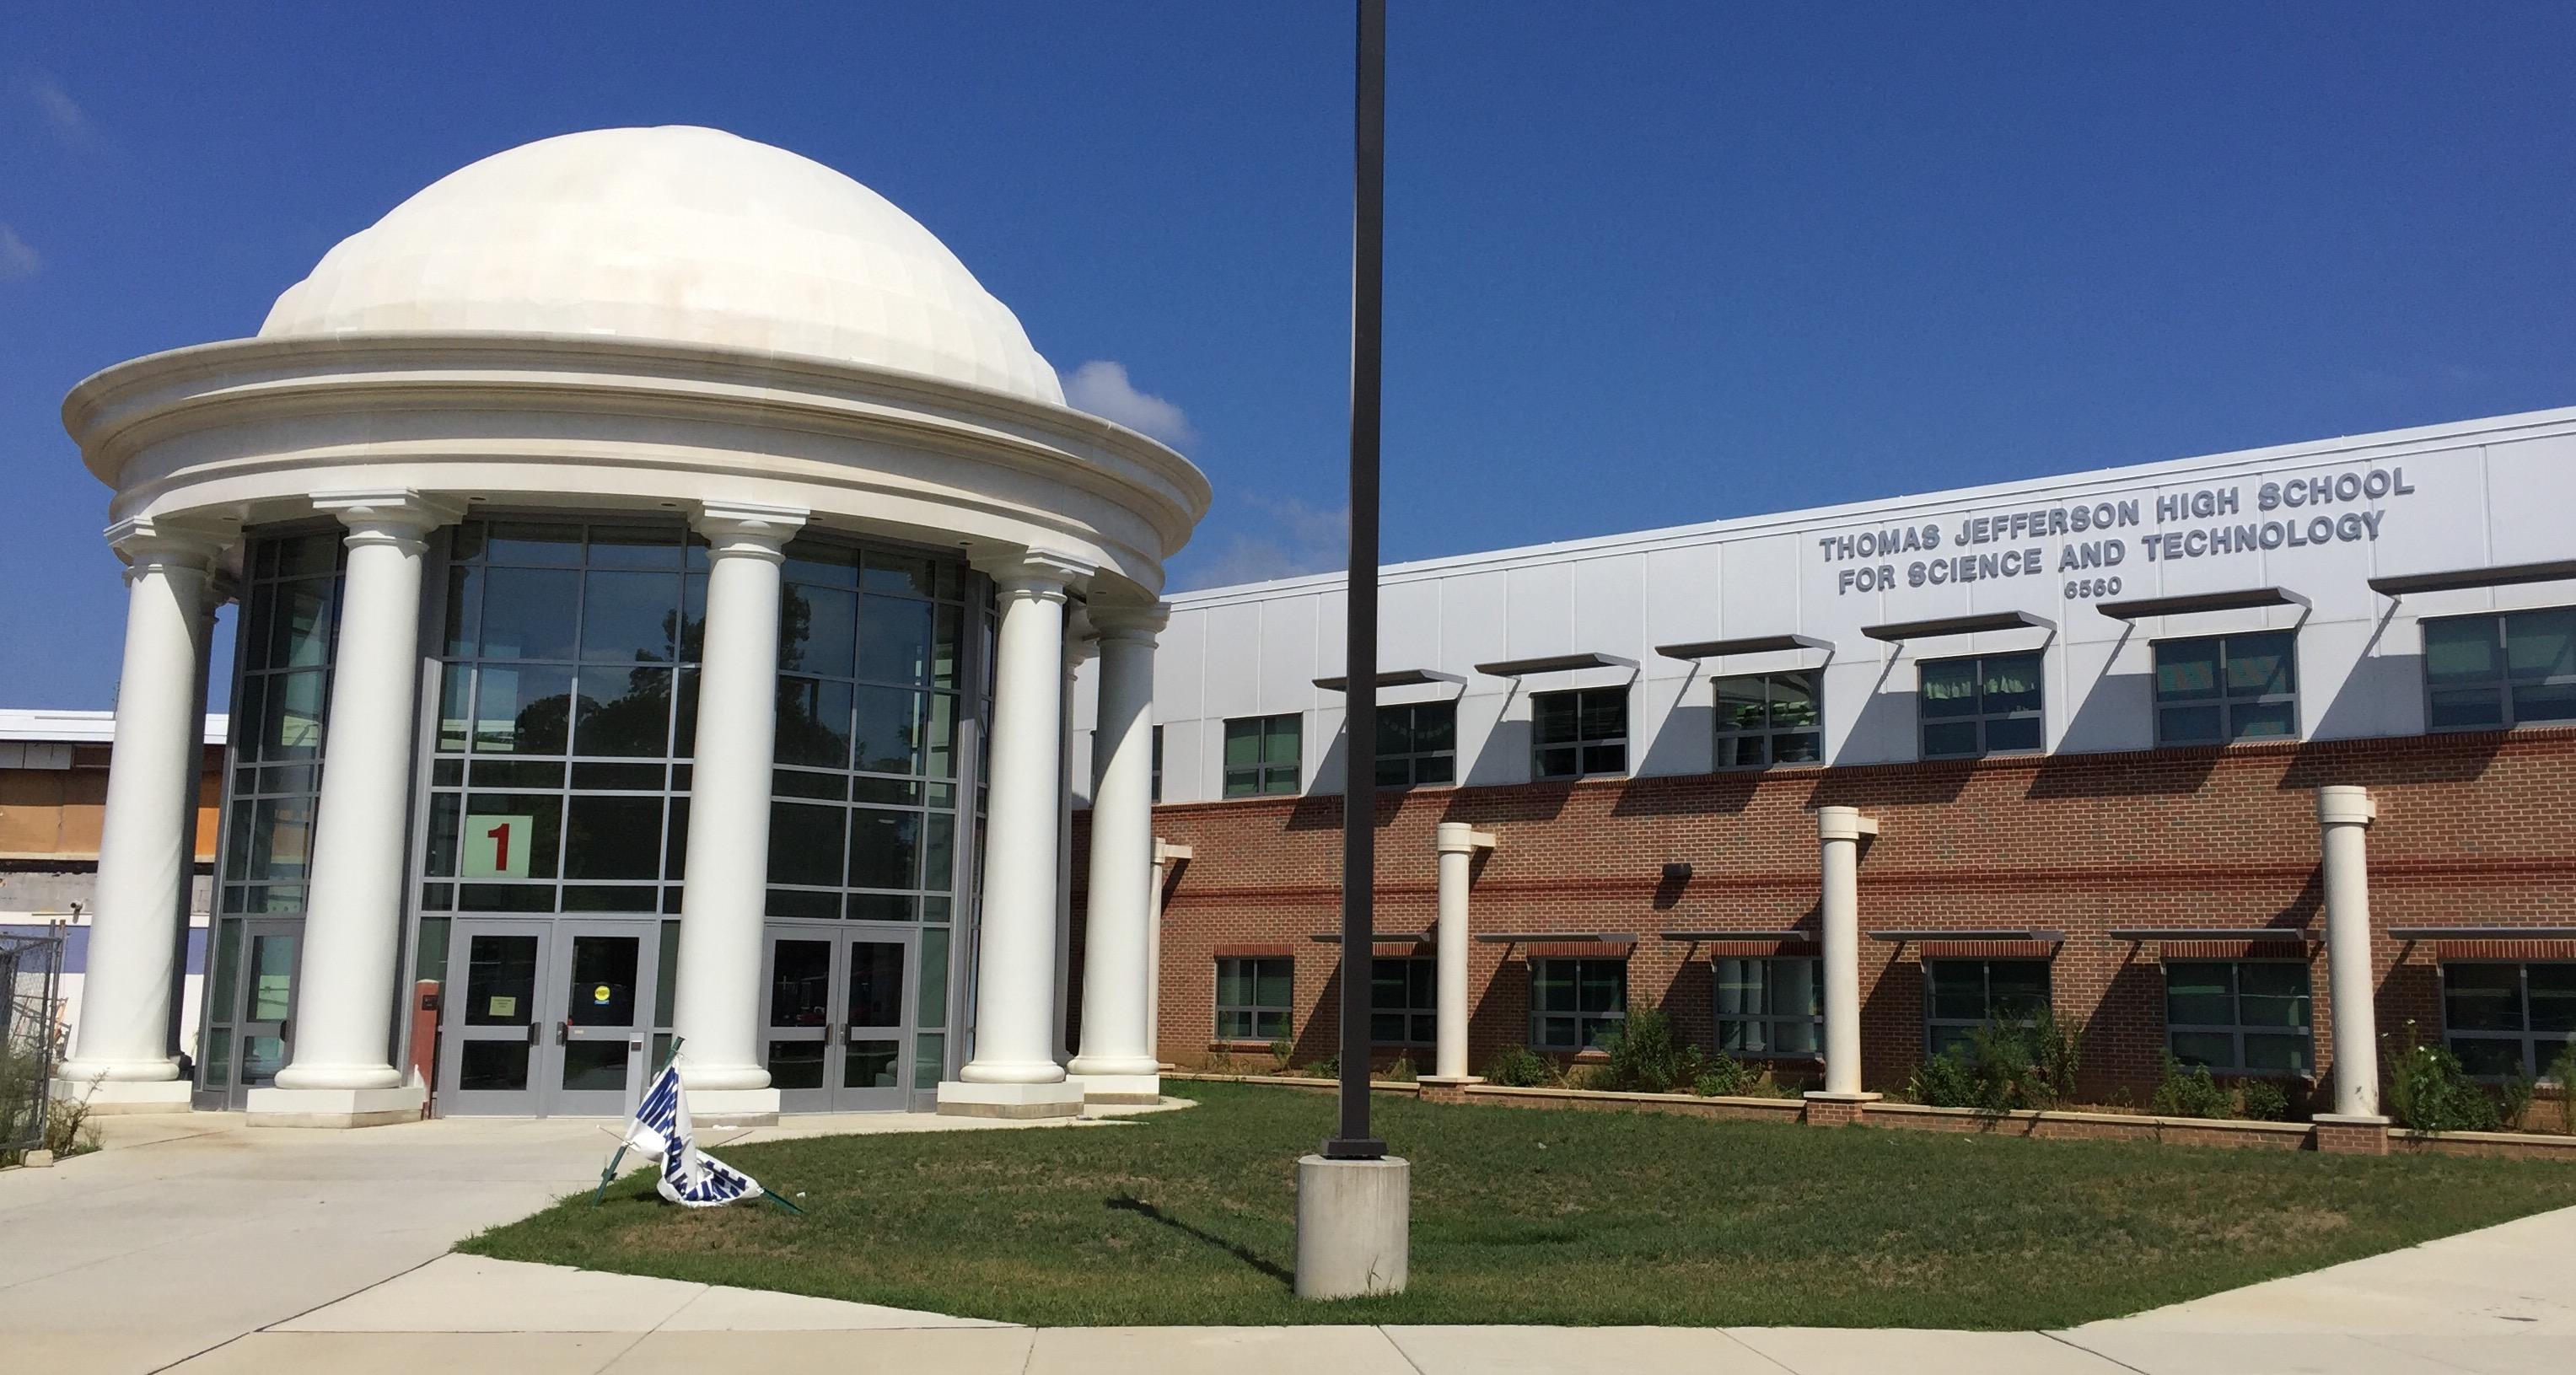 Va. high school scores No. 4 nationally in latest US News rankings